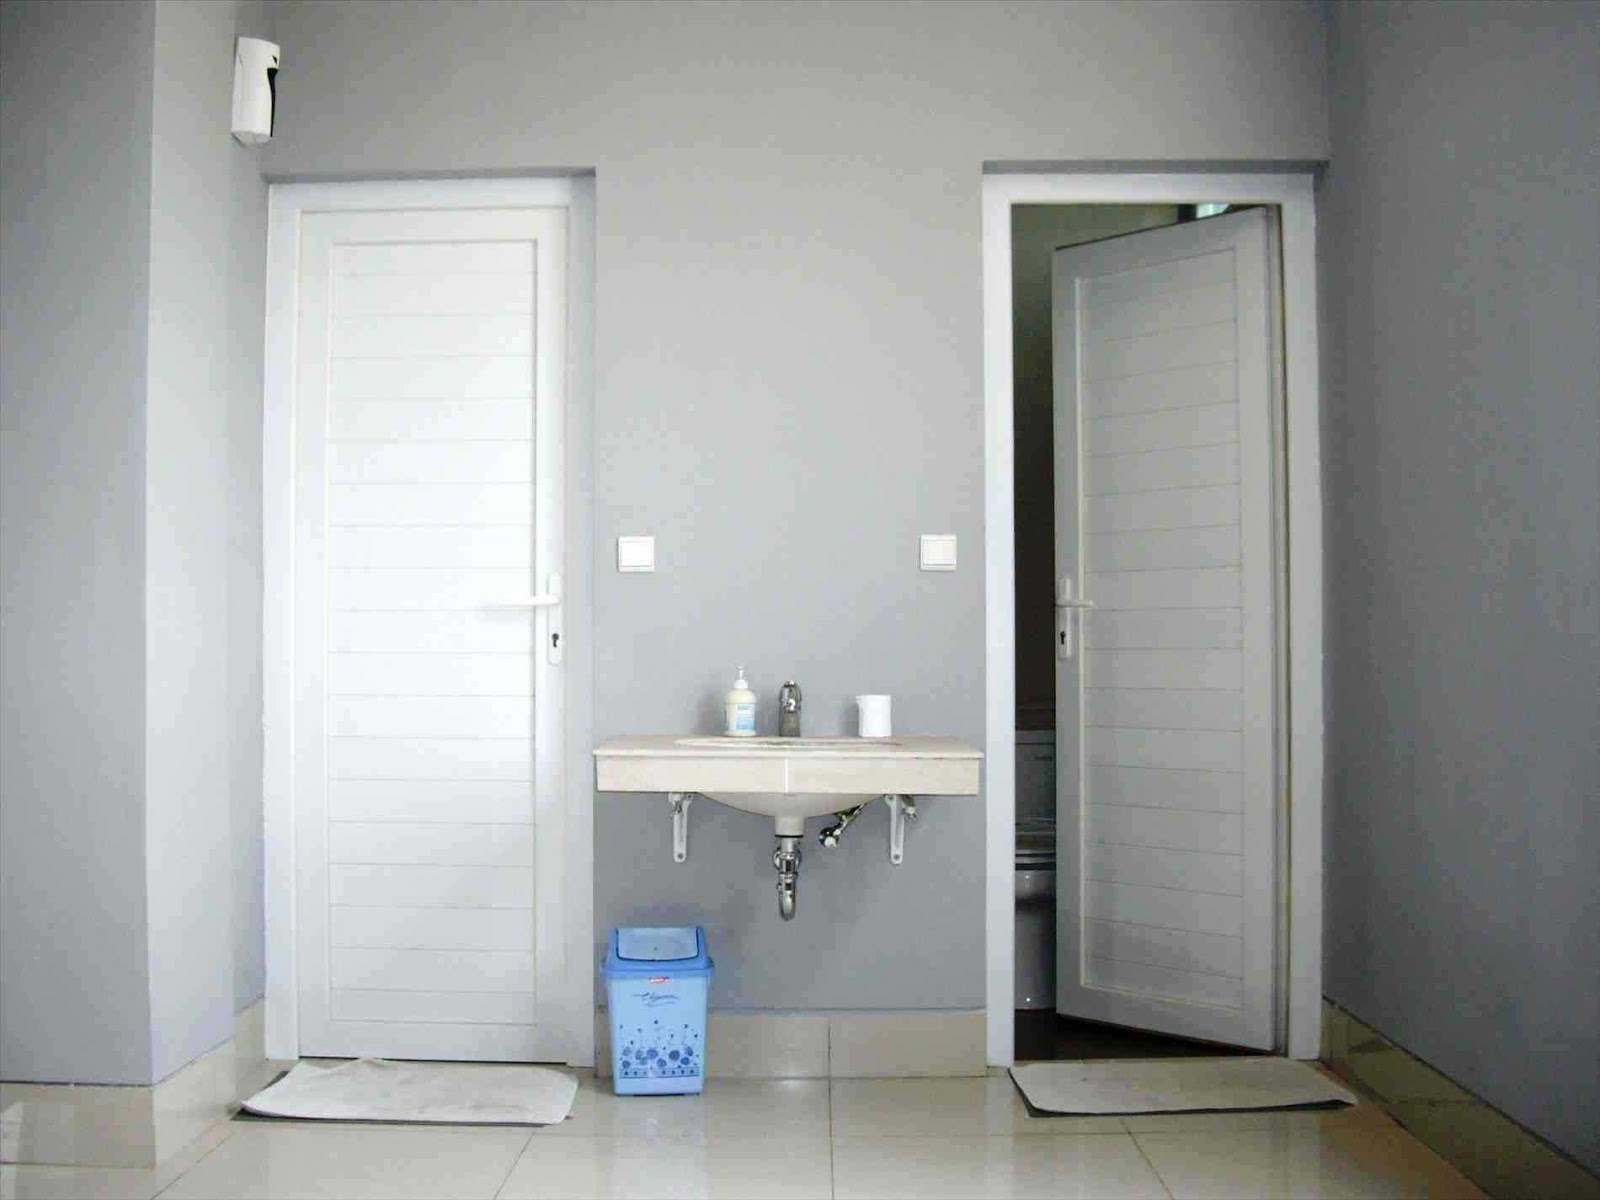 Desain Pintu Kamar Mandi Modern